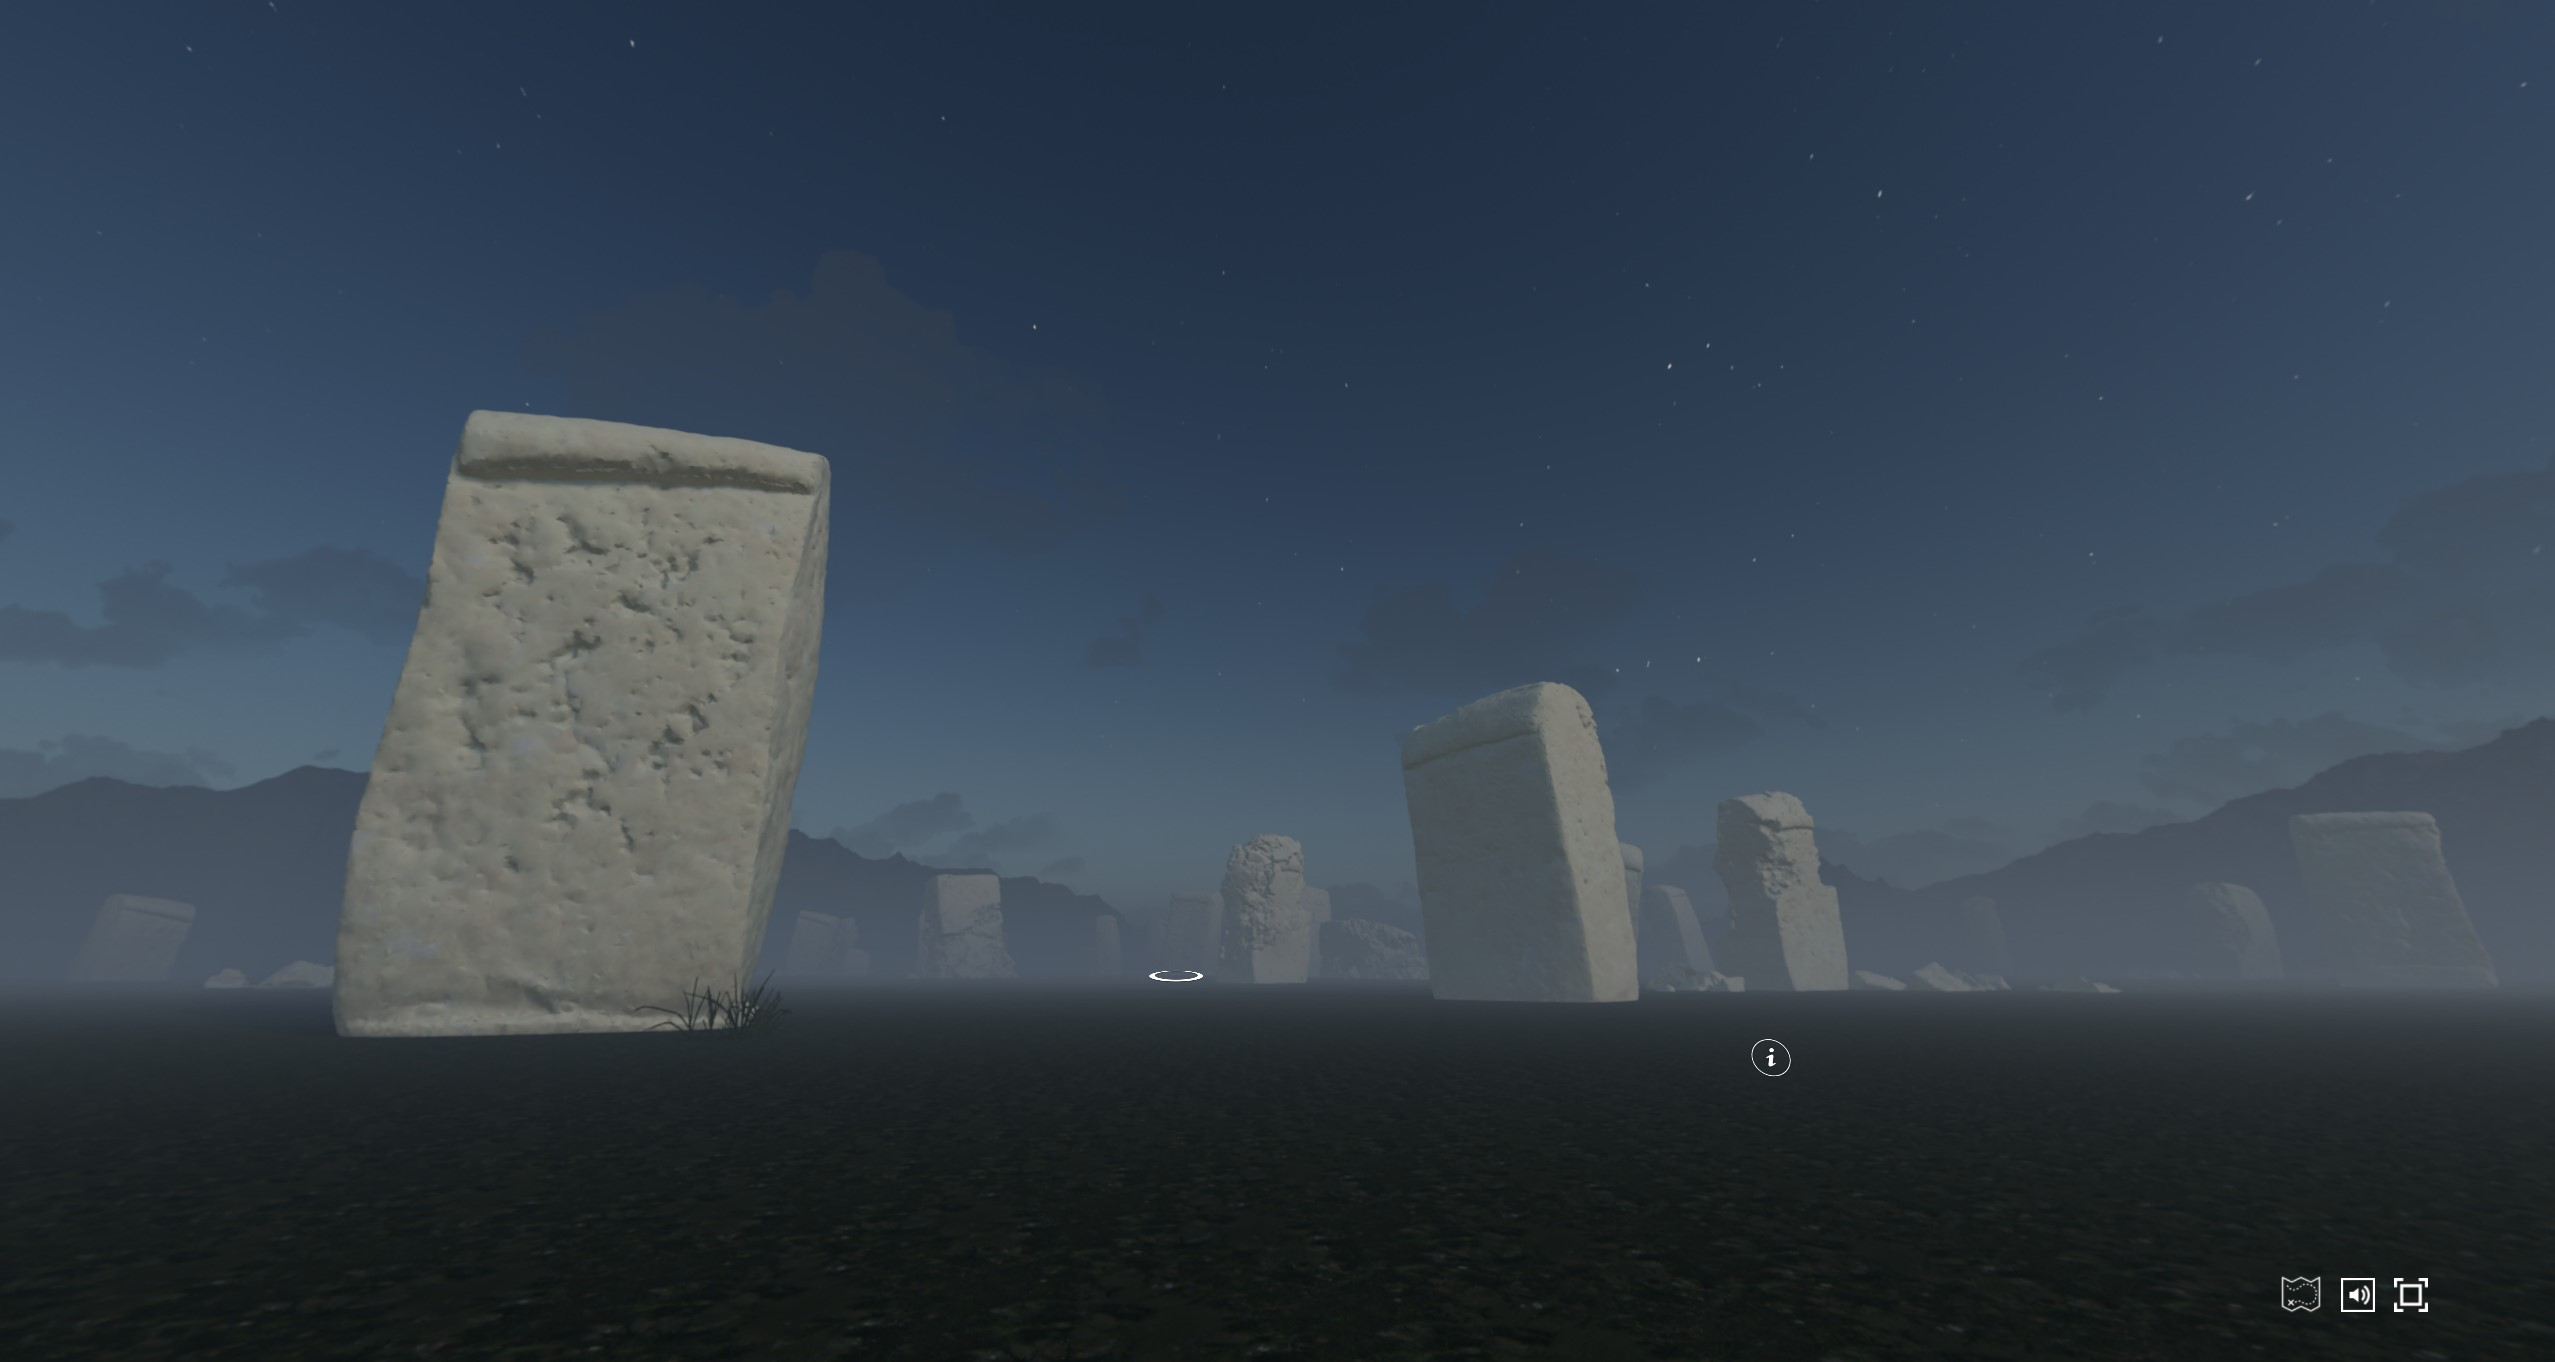 Hings_Lim_Tofu_Megalith_2021_epoch_wonderland